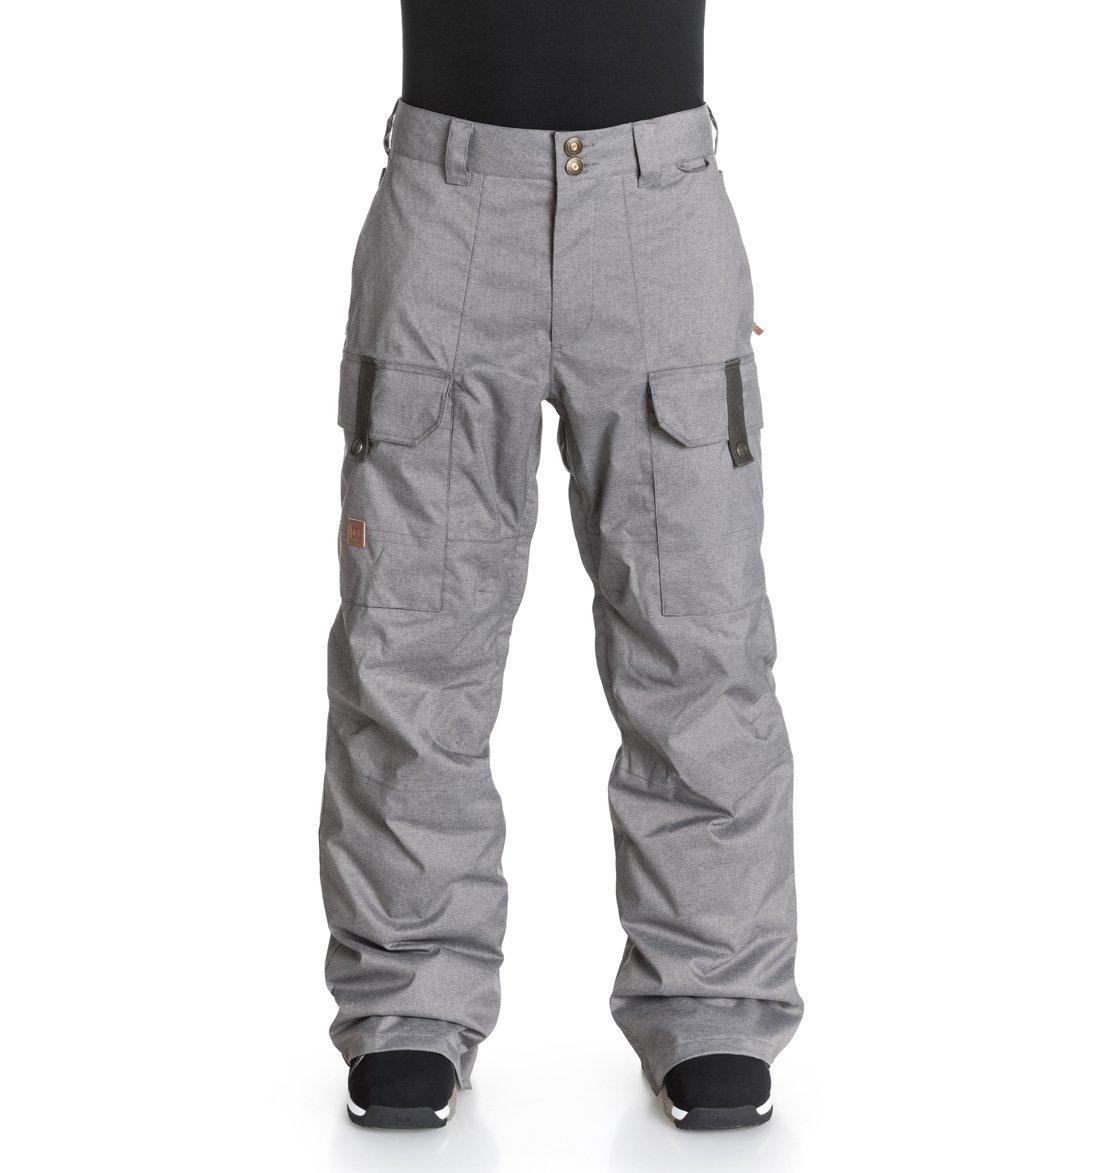 Code 0 DC EDYTP03004 Pantalones Shoes de snowboard fWqwdSvF